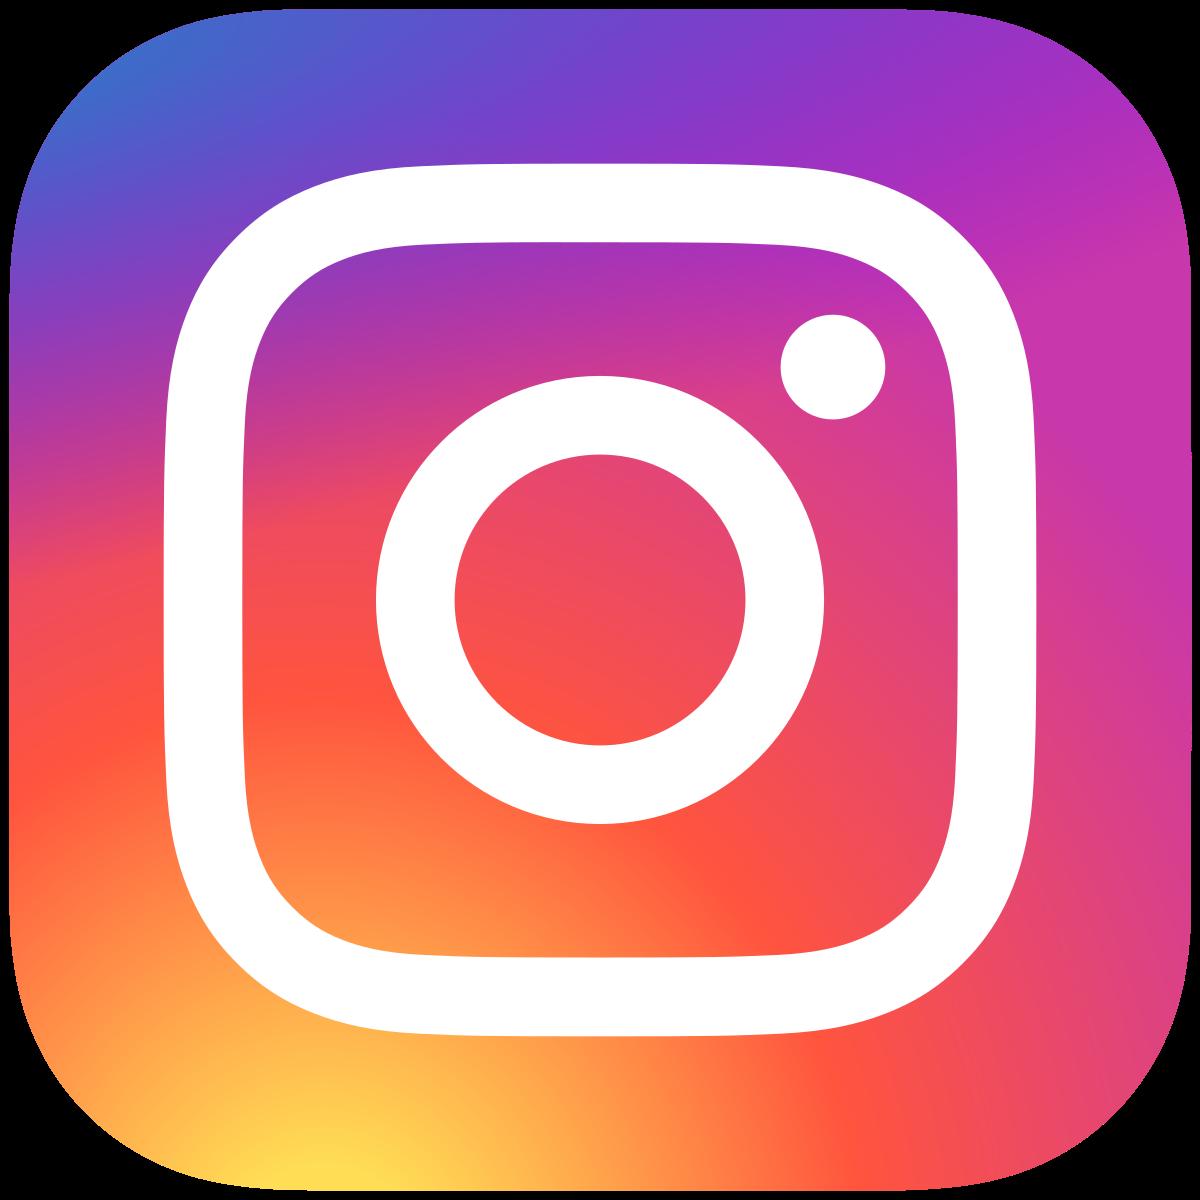 application photo 16 9 en format instagram